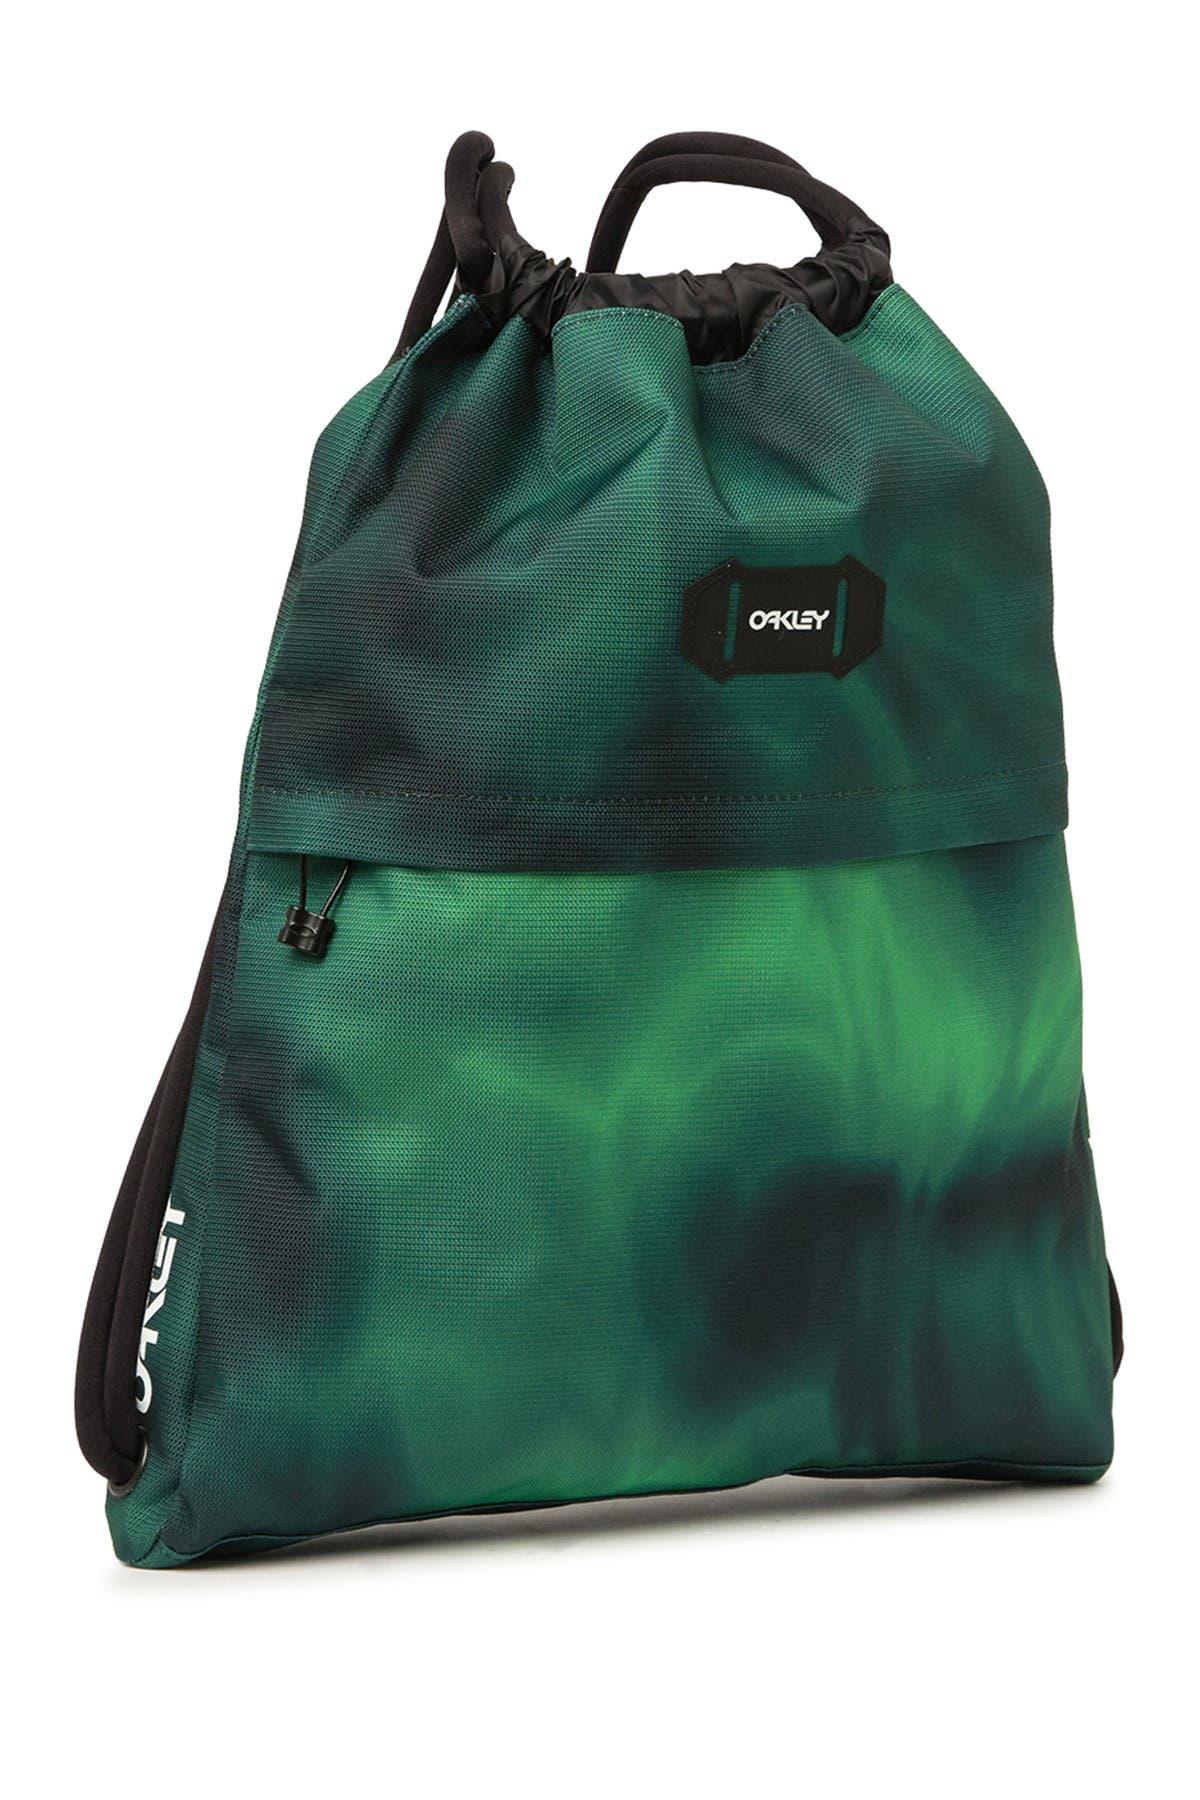 Image of Oakley Street Satchel Drawstring Bag